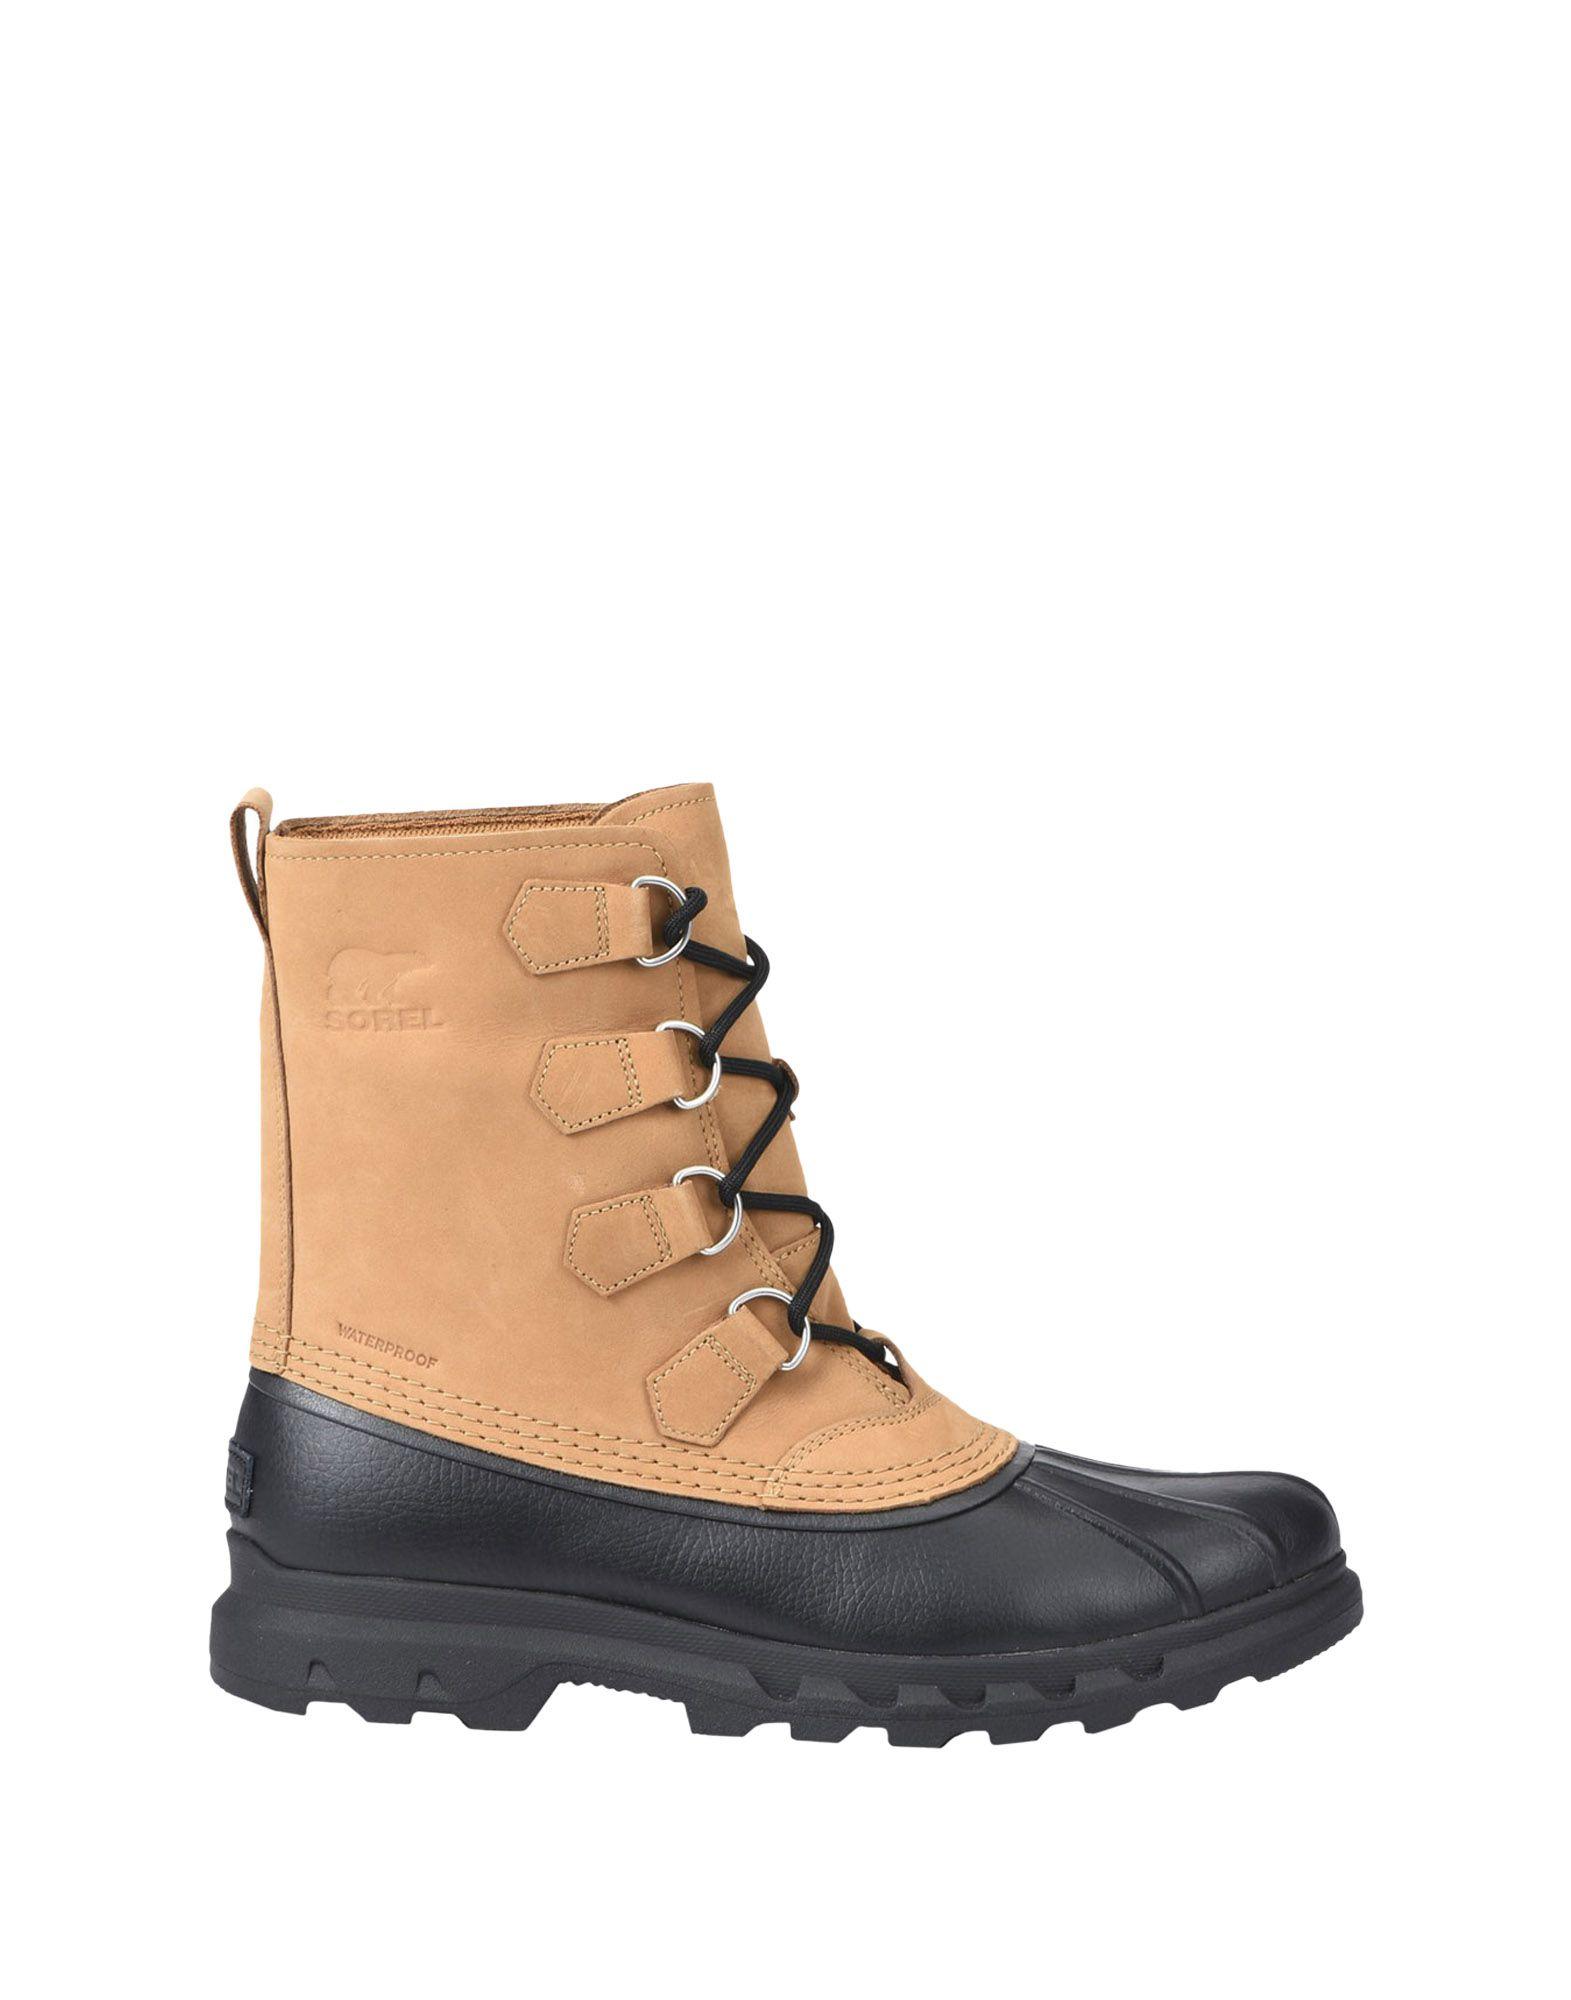 Portzman Classique - Chaussures - Bottines Sorel nBc0OYW